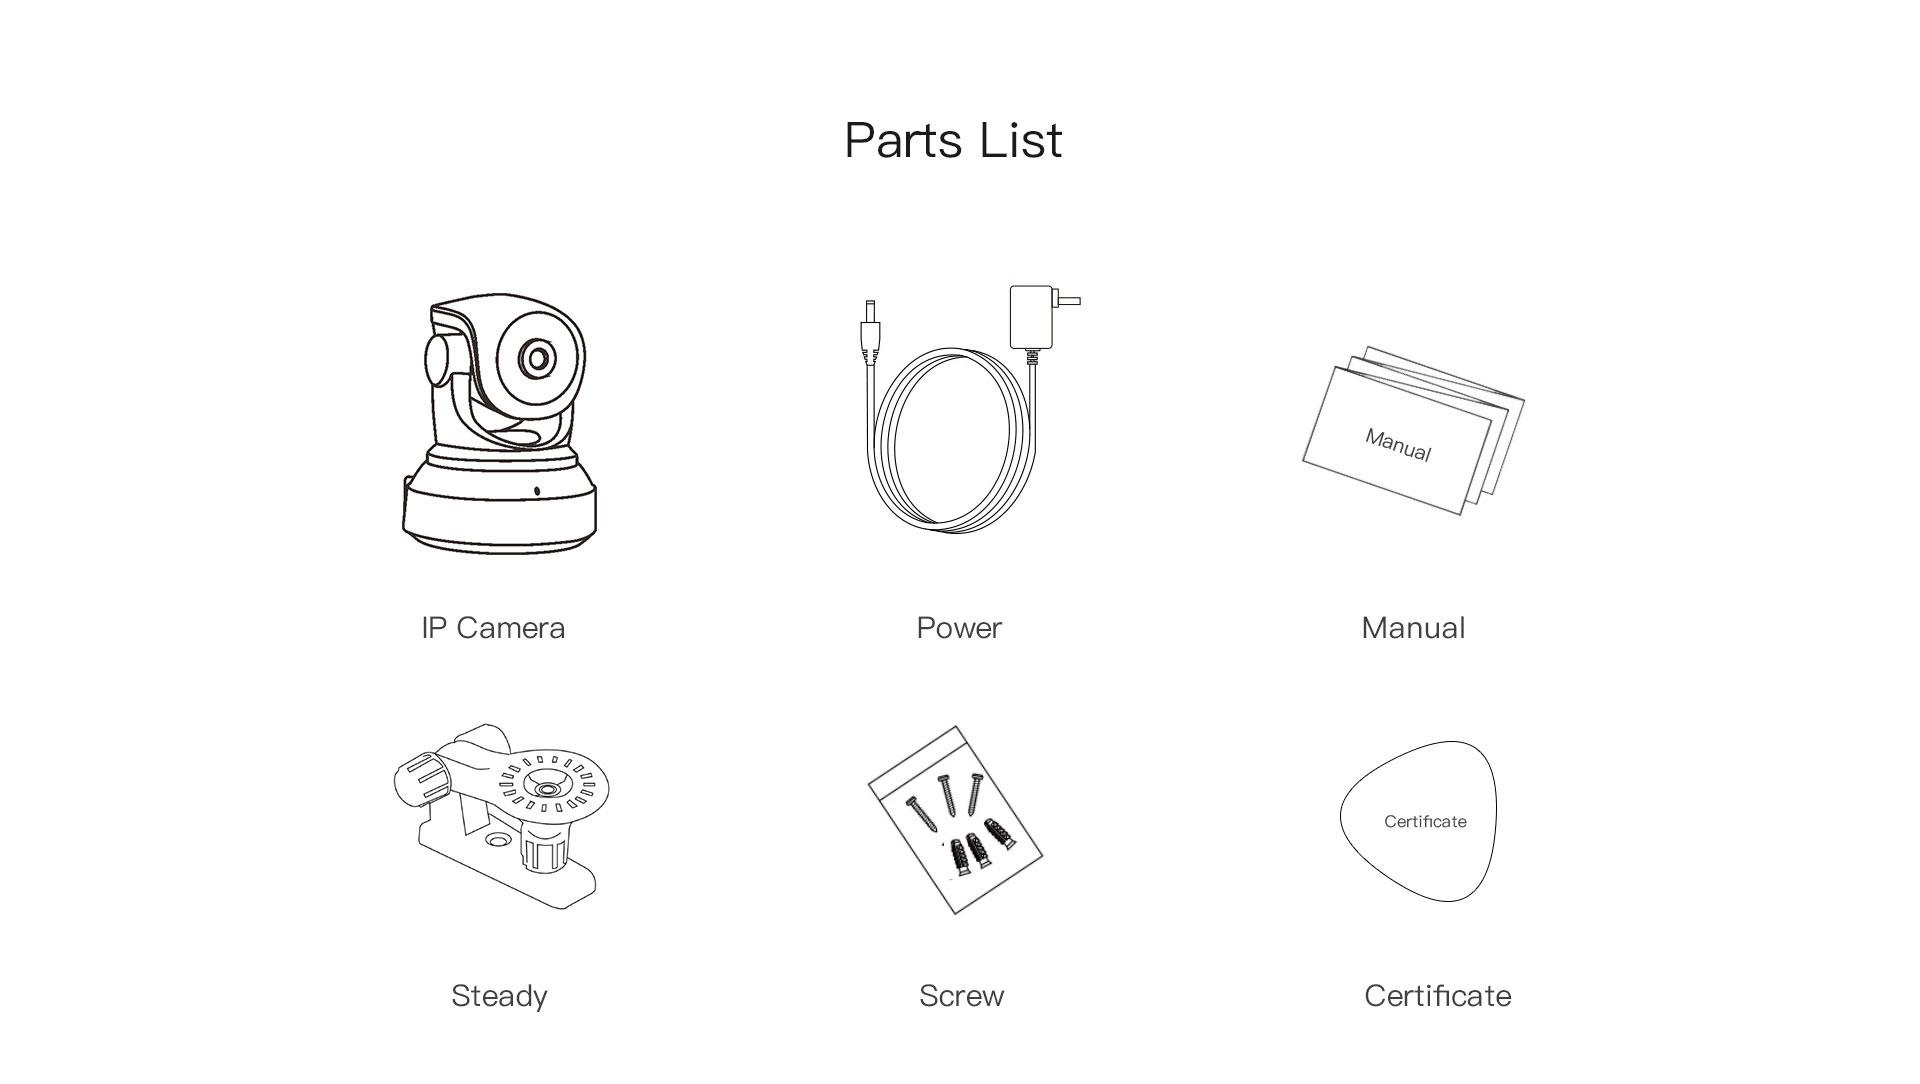 indoor security camera parts list